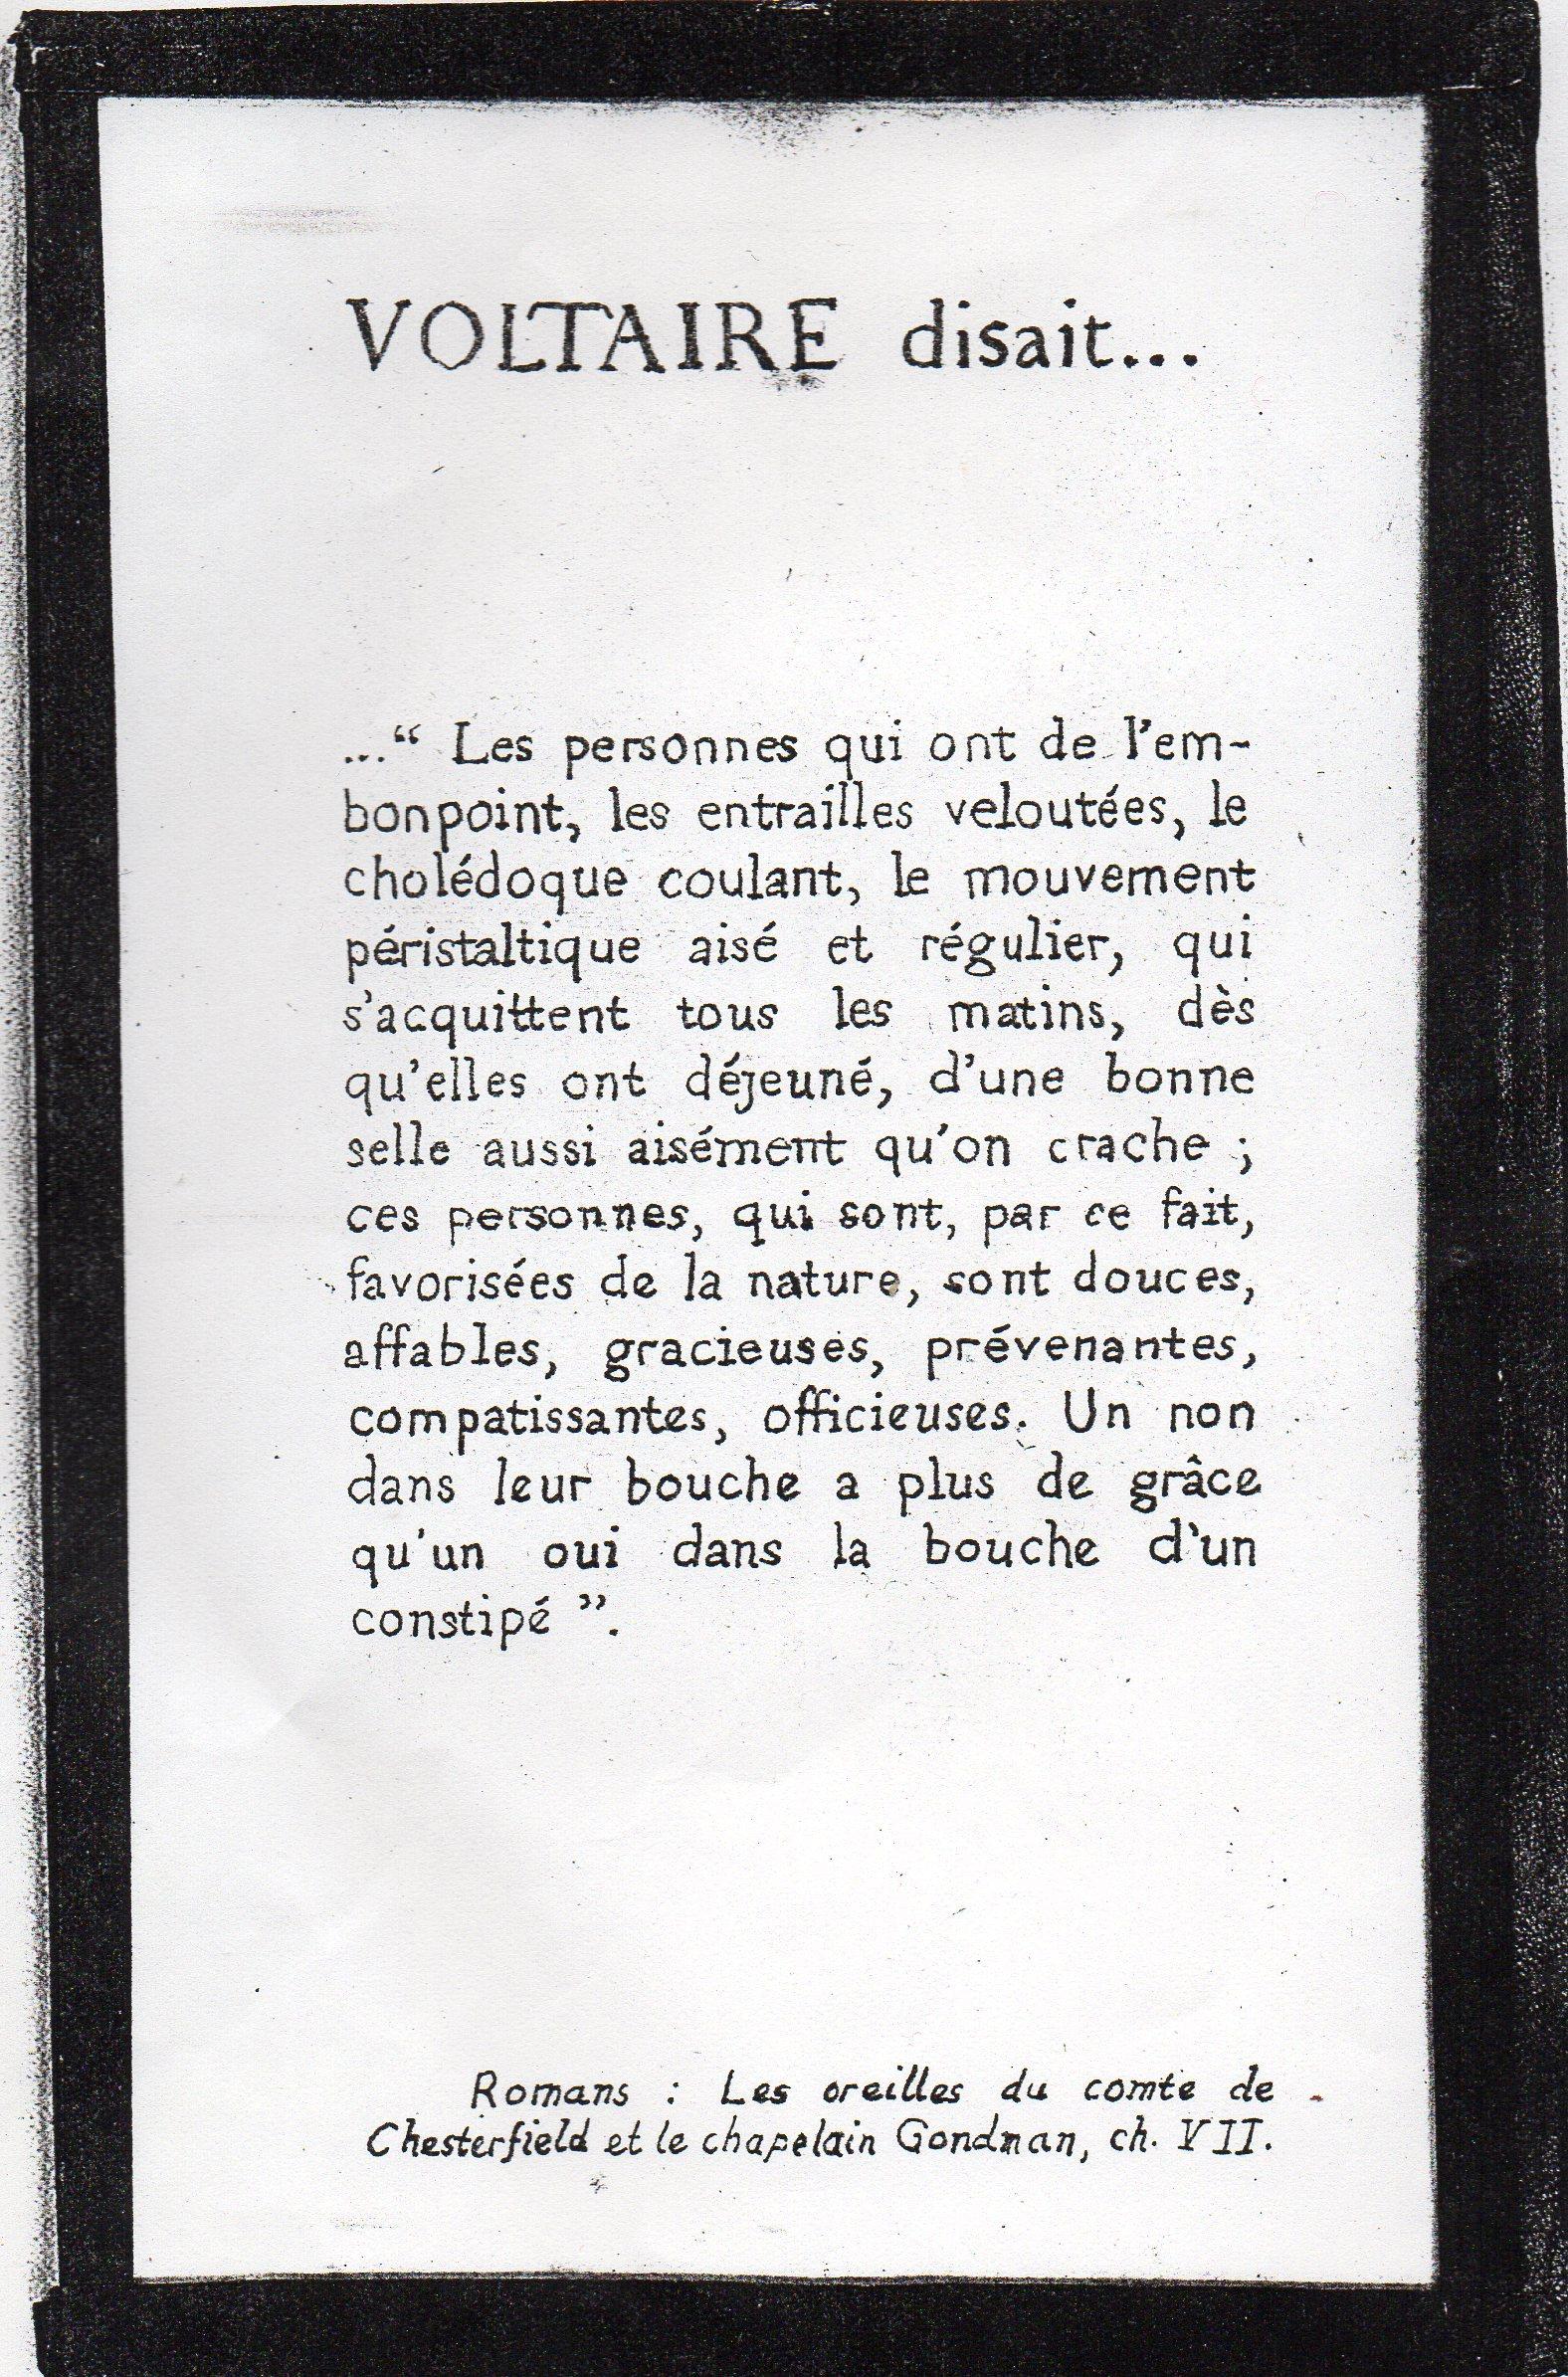 Voltaire disait..085